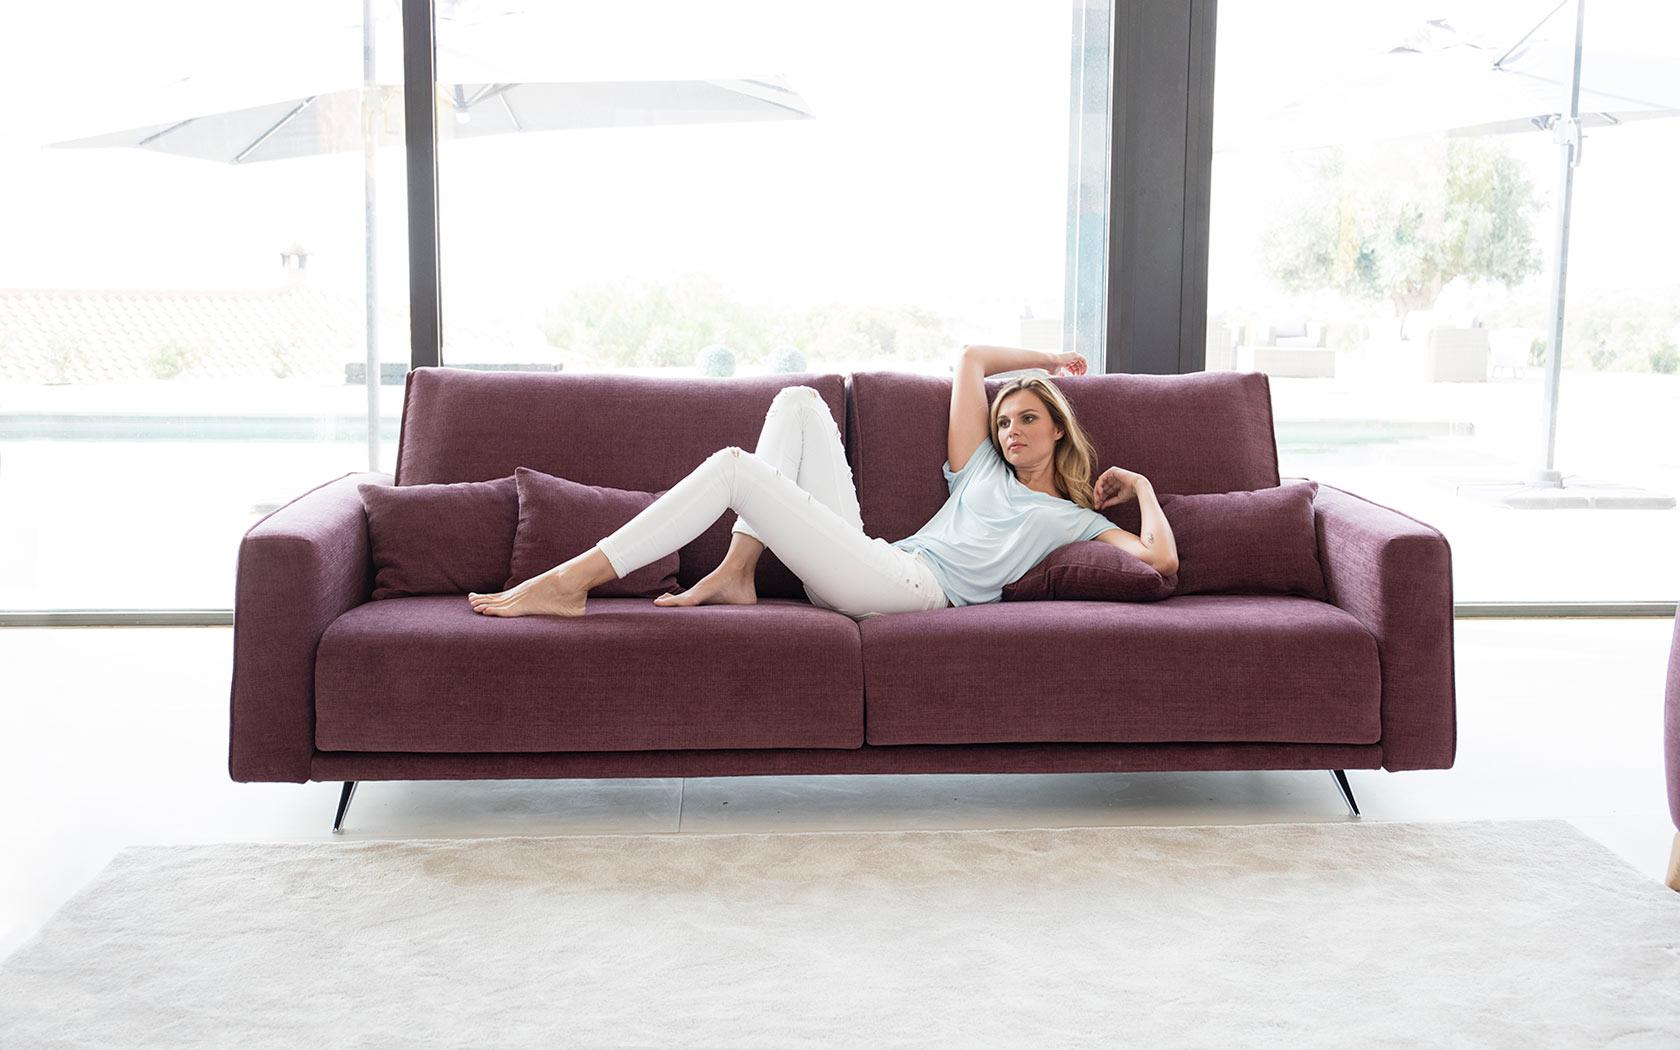 Boston sofa Fama 2019 01